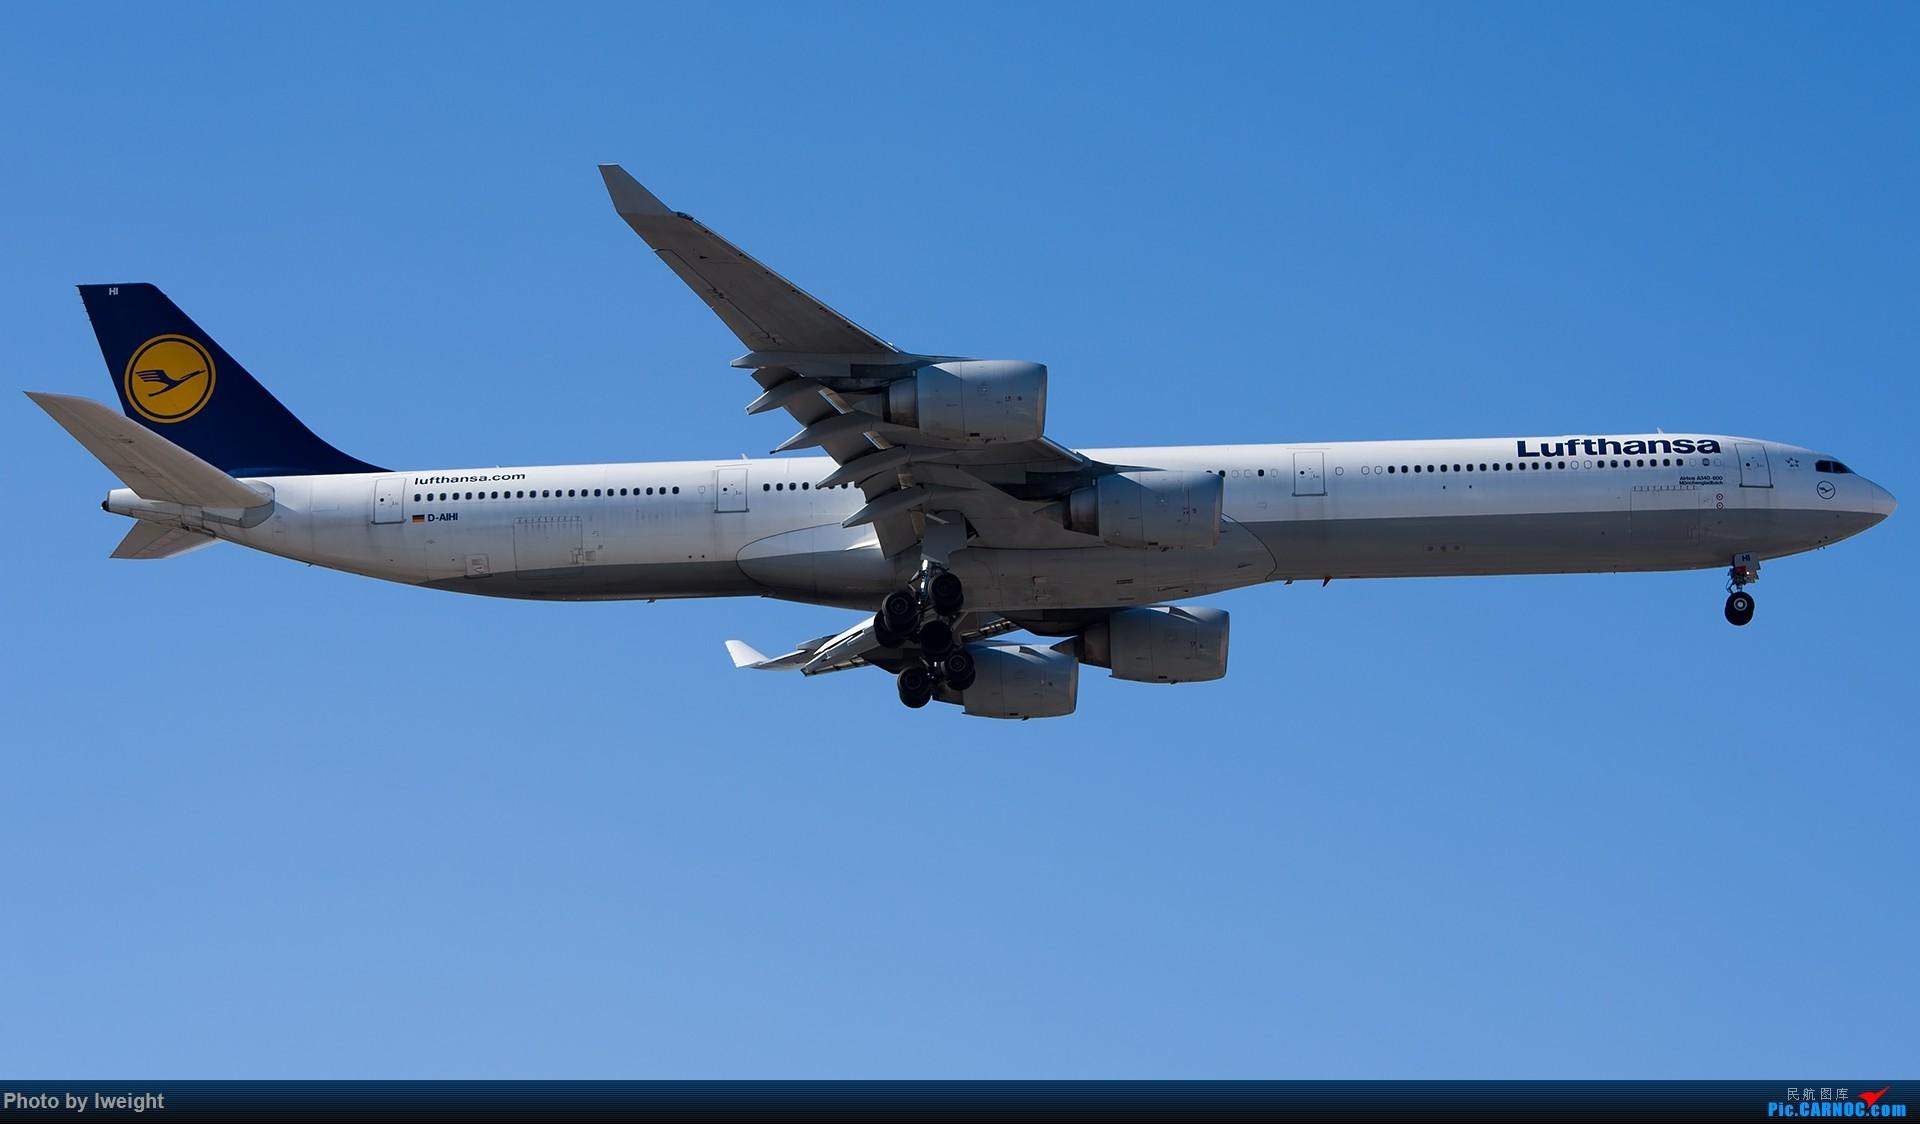 Re:[原创]终于在12月的北京等到了一个晴天的周末,出来拍拍飞机【2015-12-5】 AIRBUS A340-600 D-AIHI 中国北京首都国际机场